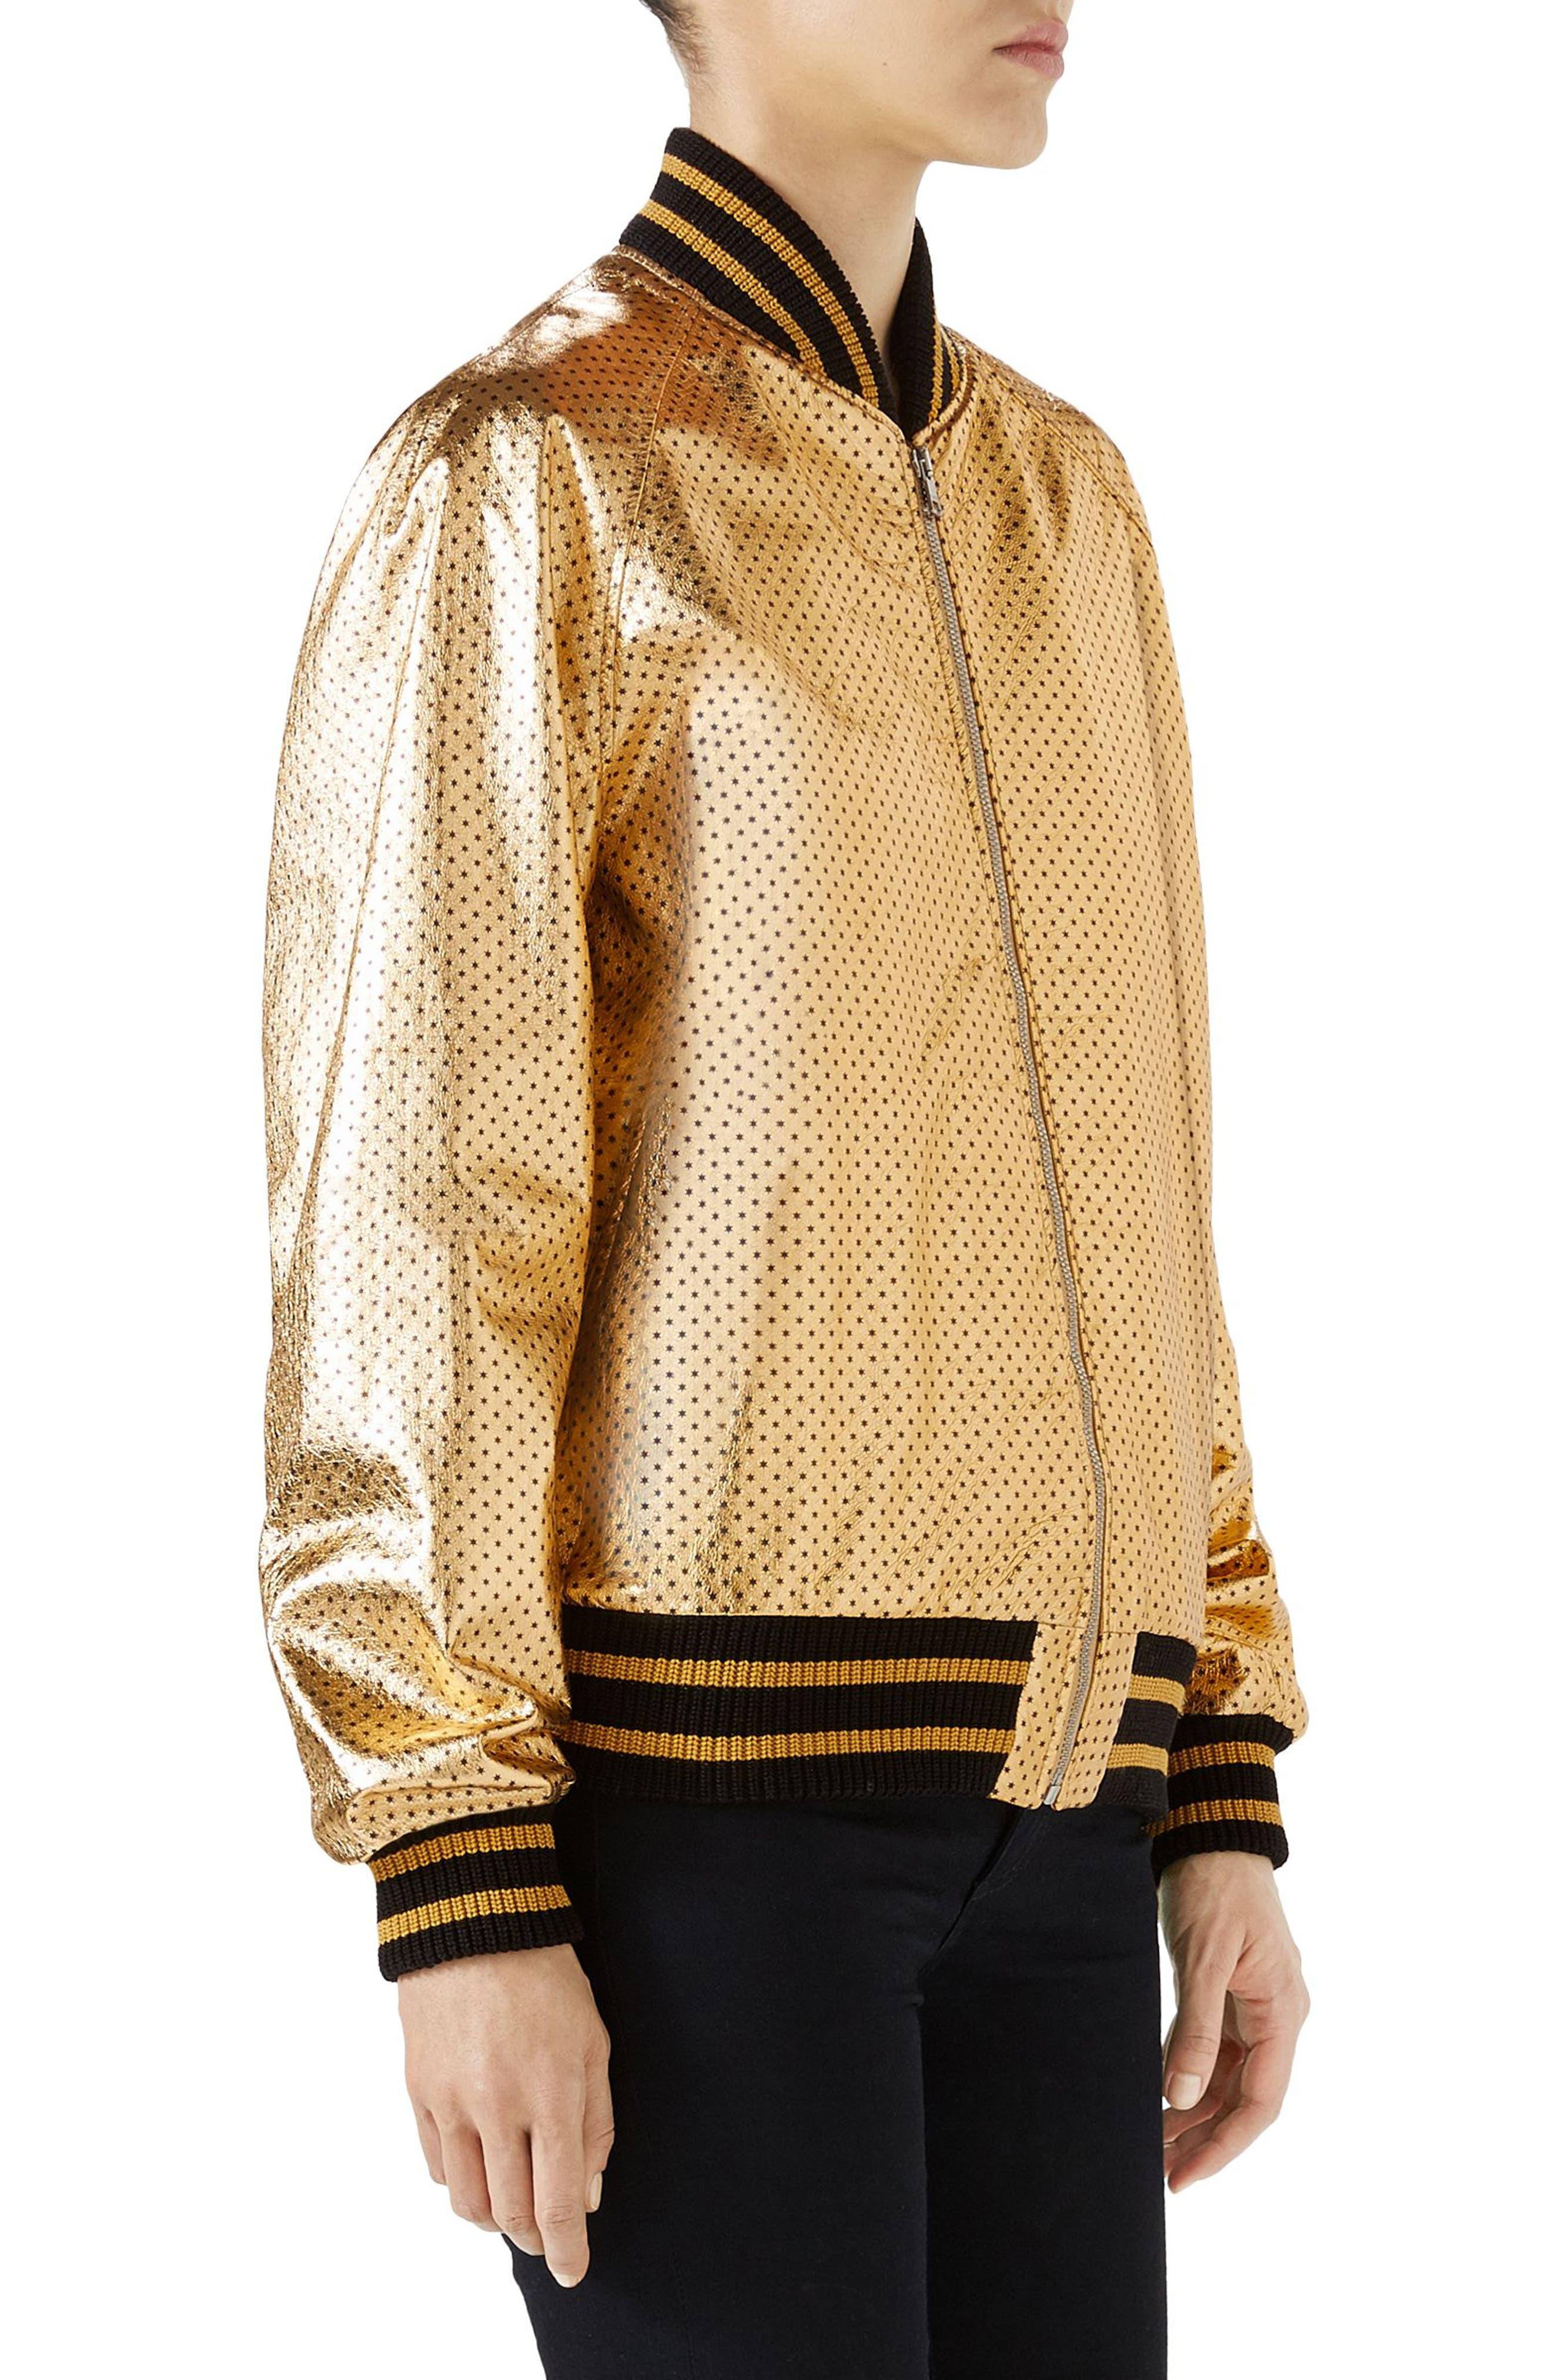 Metallic Perforated Leather Bomber Jacket,                             Alternate thumbnail 3, color,                             Gold/ Black